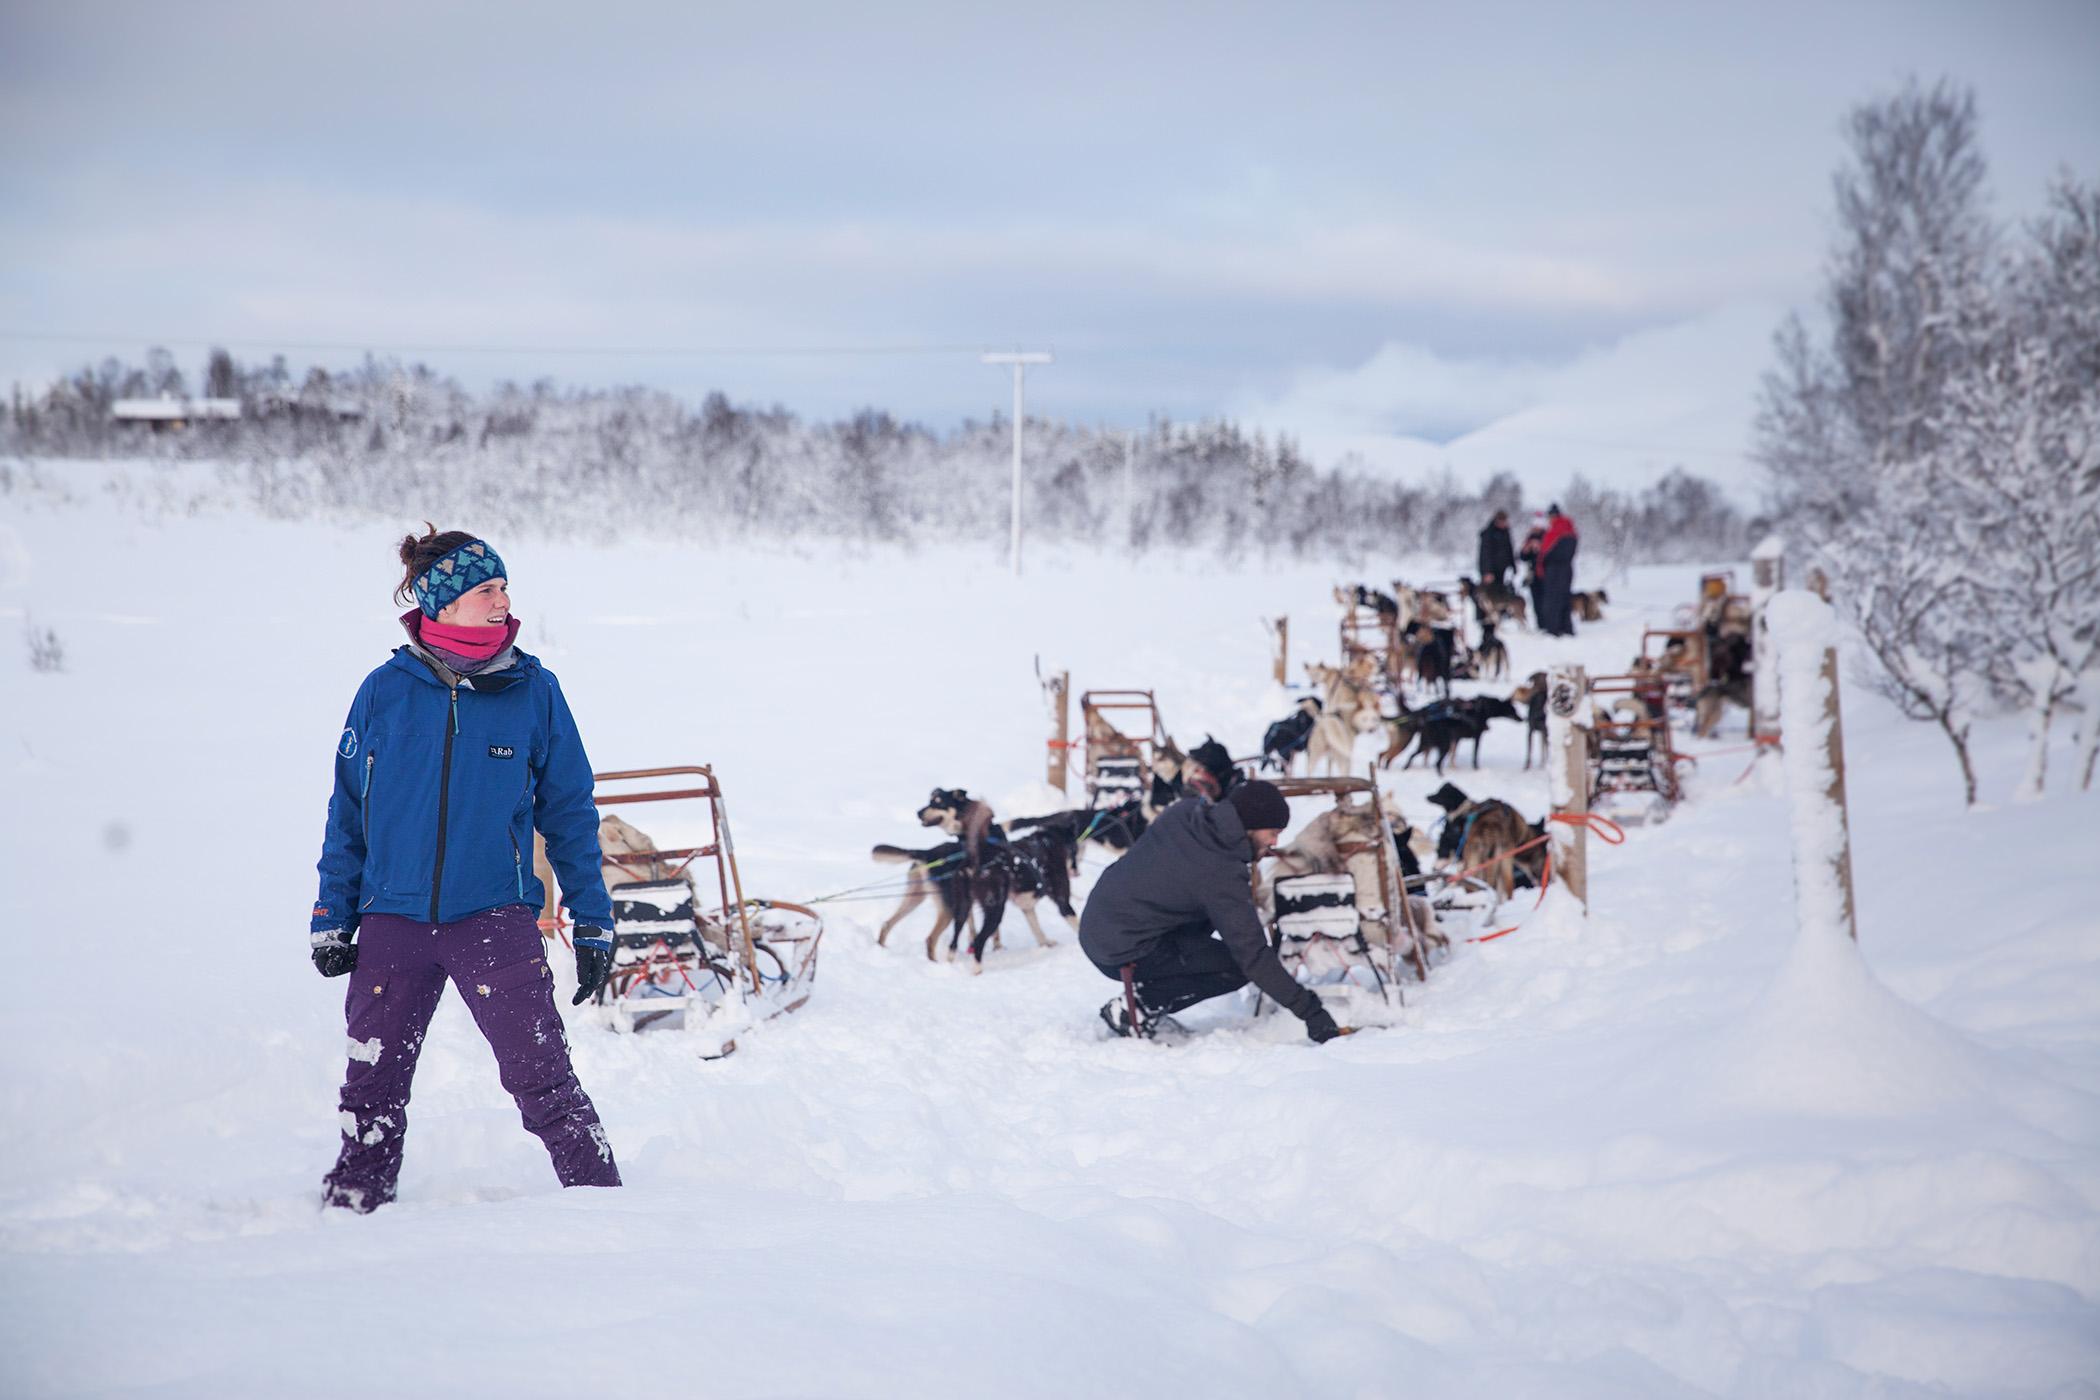 kennel manager Sophia organising the dog sledding teams